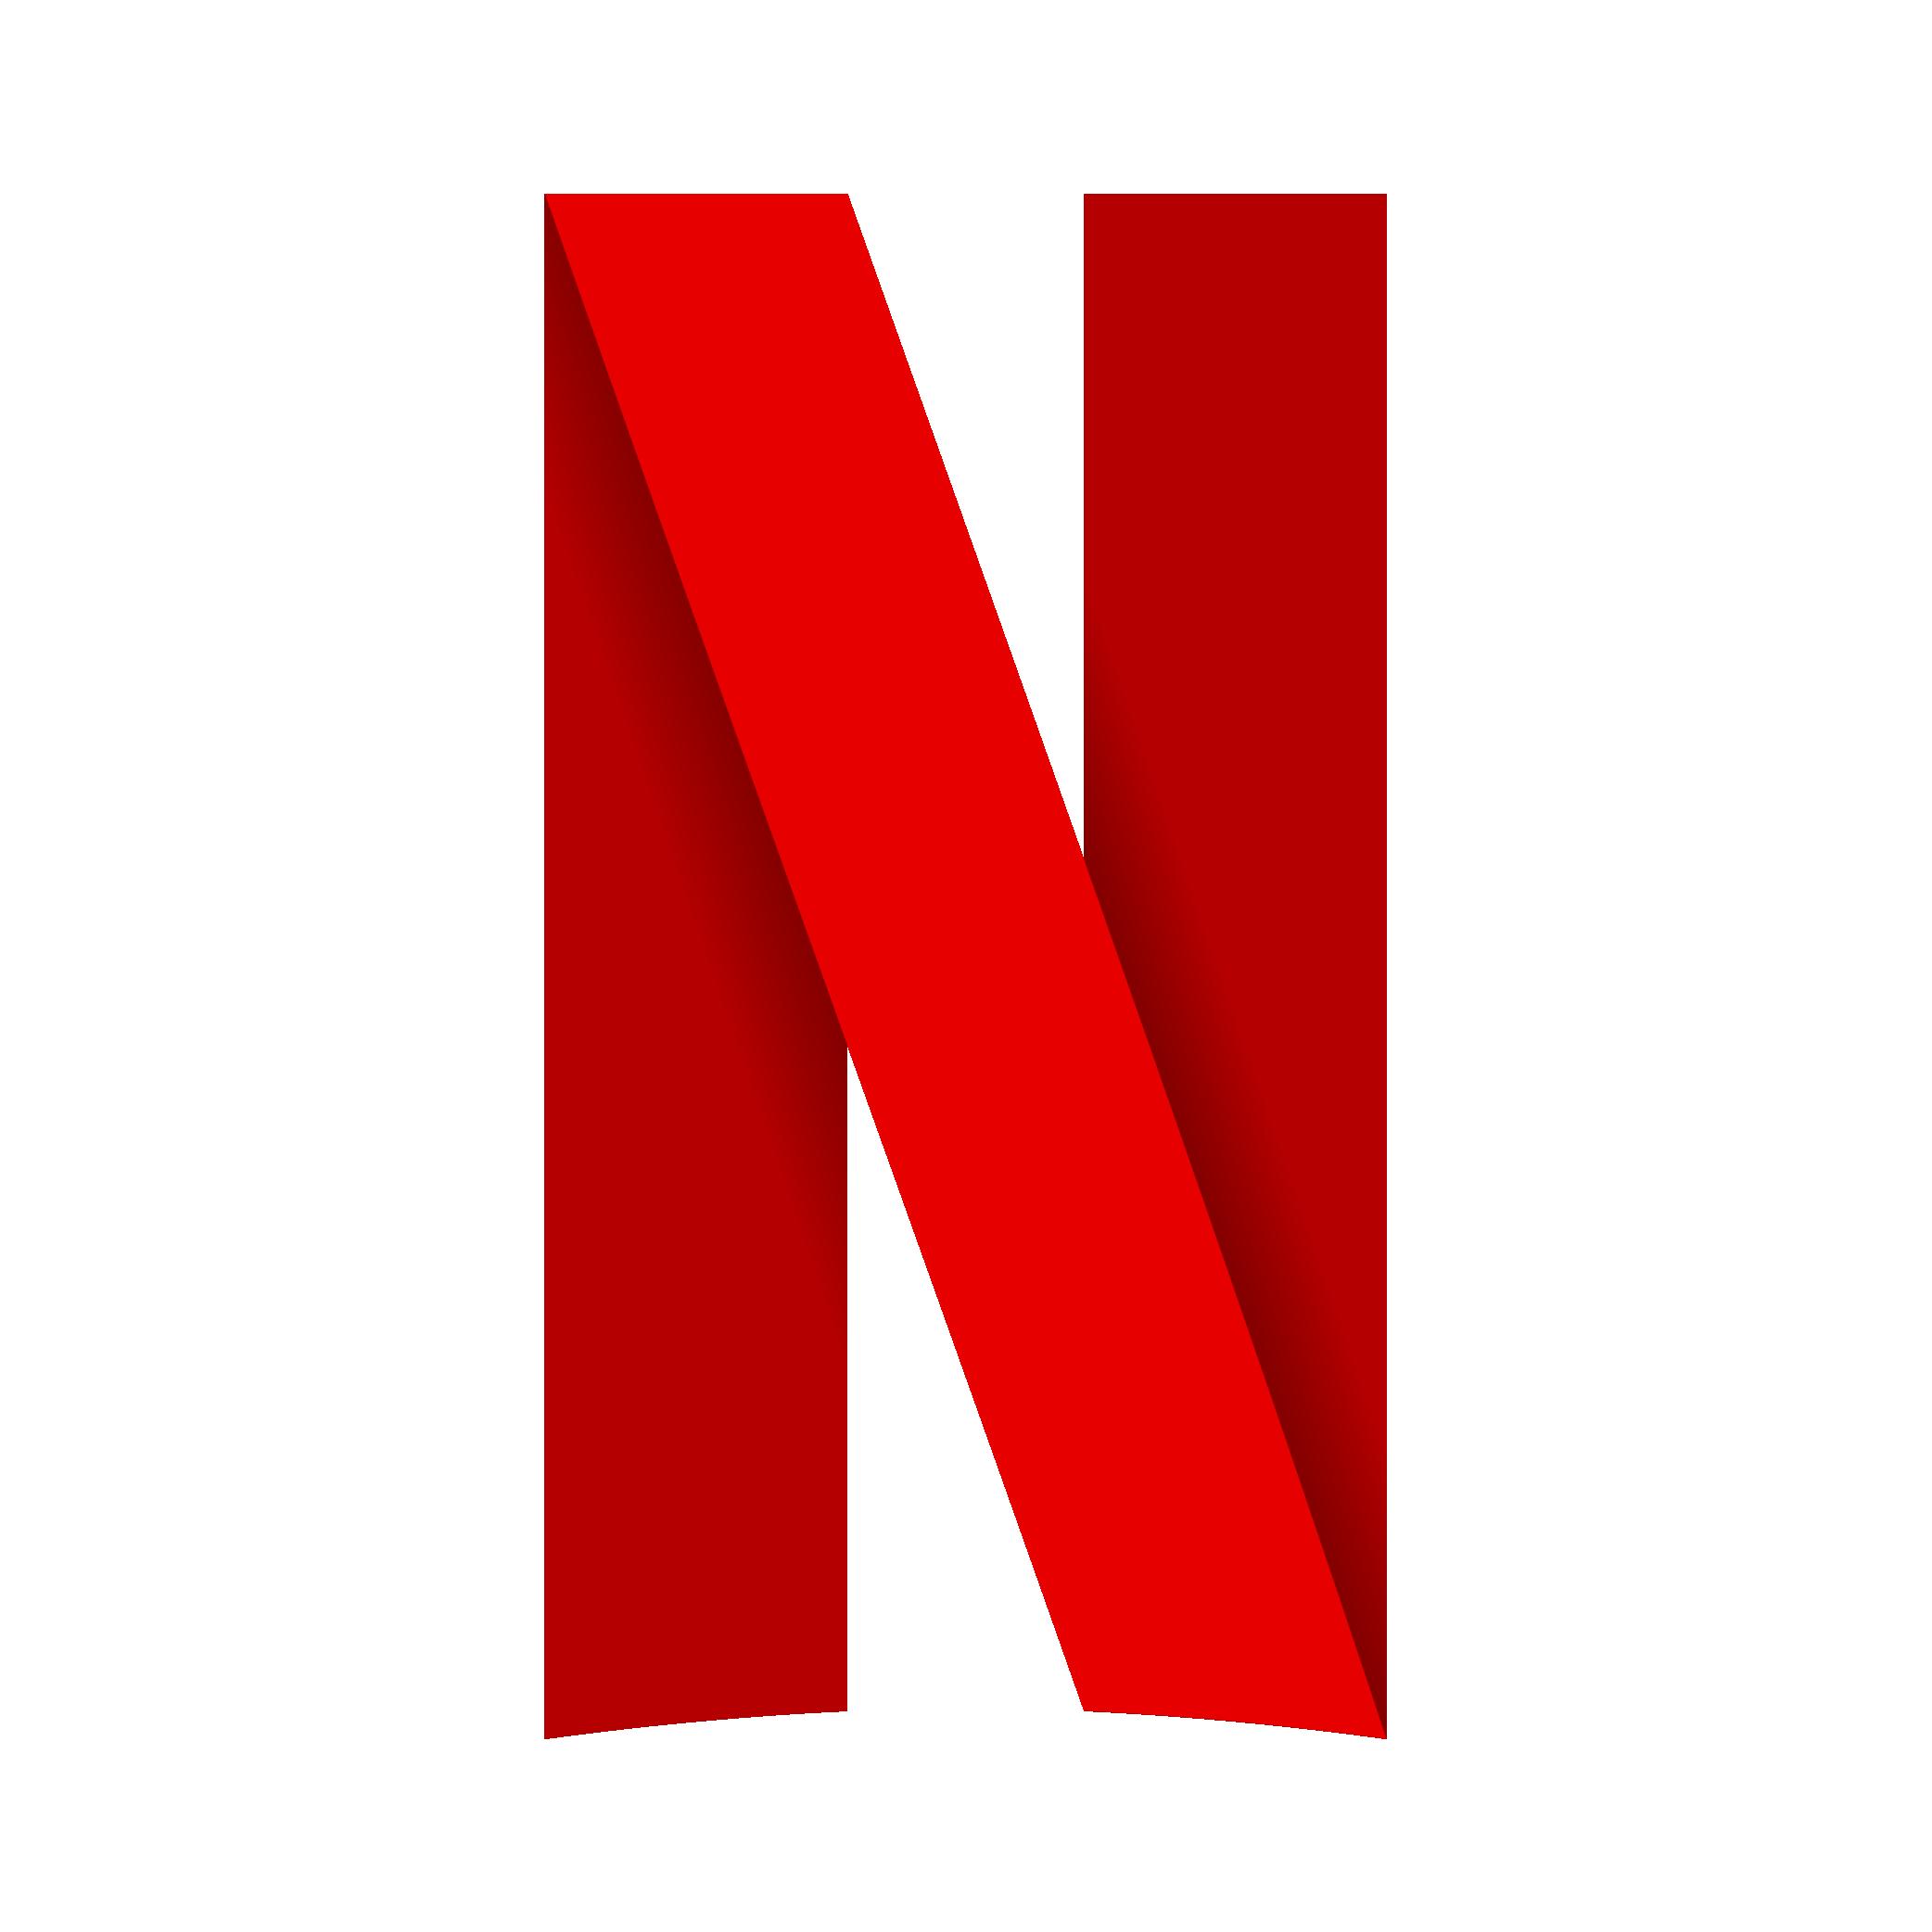 Netflix clipart svg Netflix logo transparent clipart images gallery for free ... svg